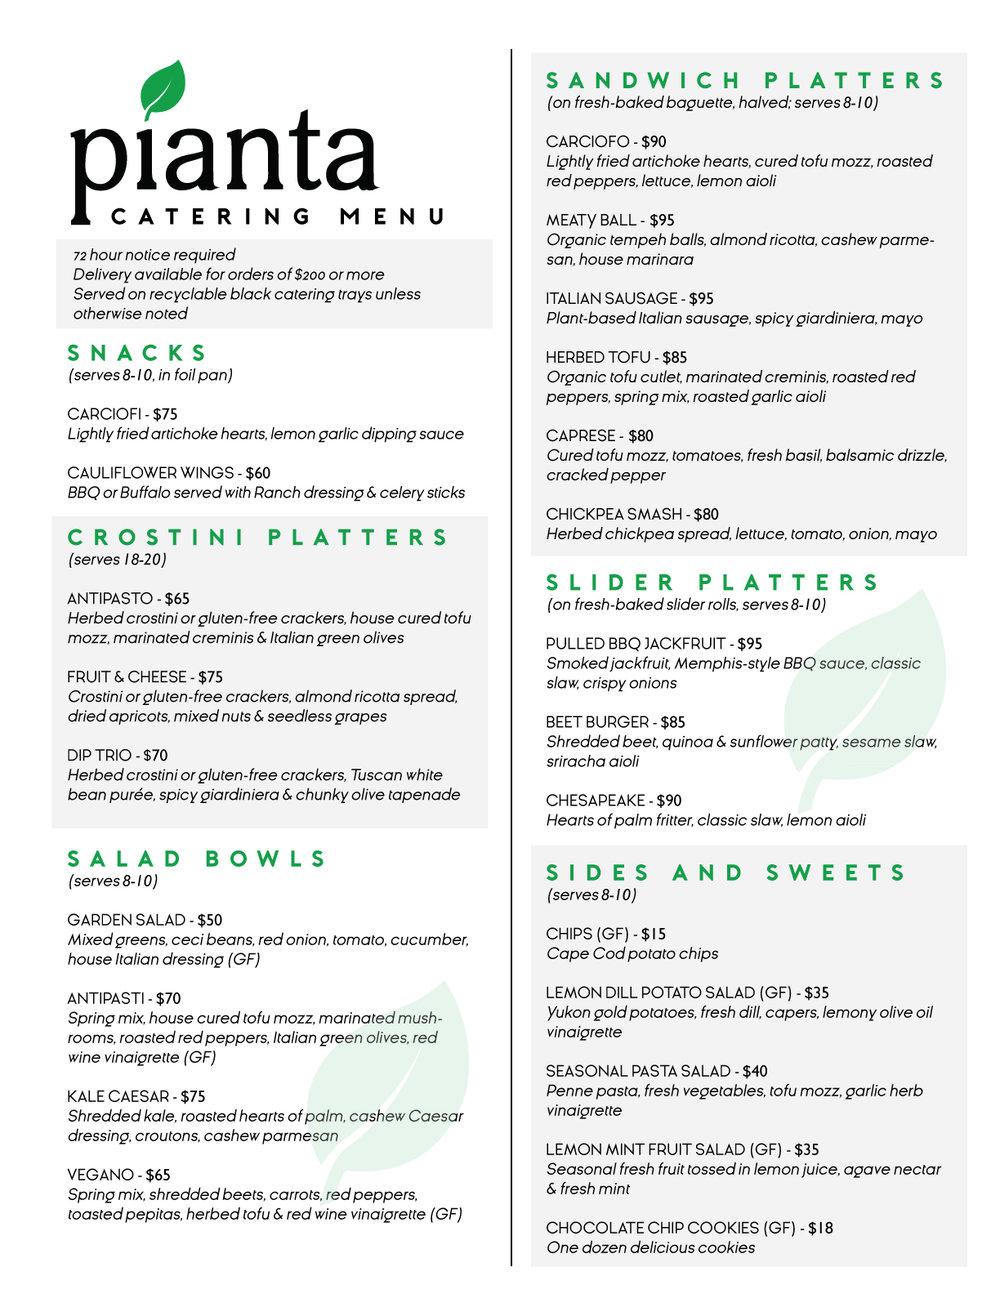 Pianta_CateringMenu_Final Use this.jpg